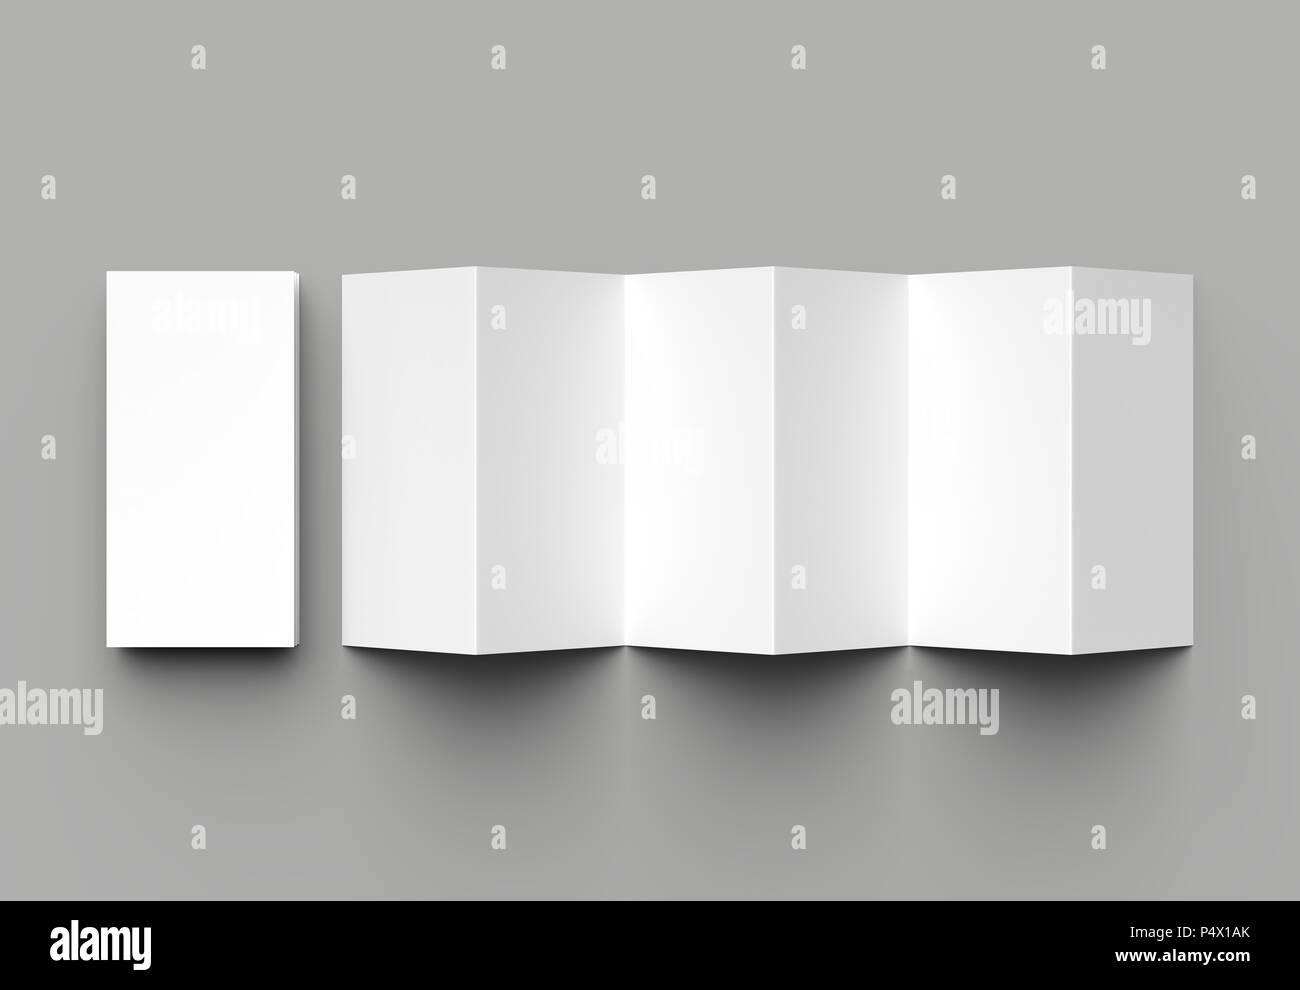 12 page leaflet 6 panel accordion fold z fold vertical brochure